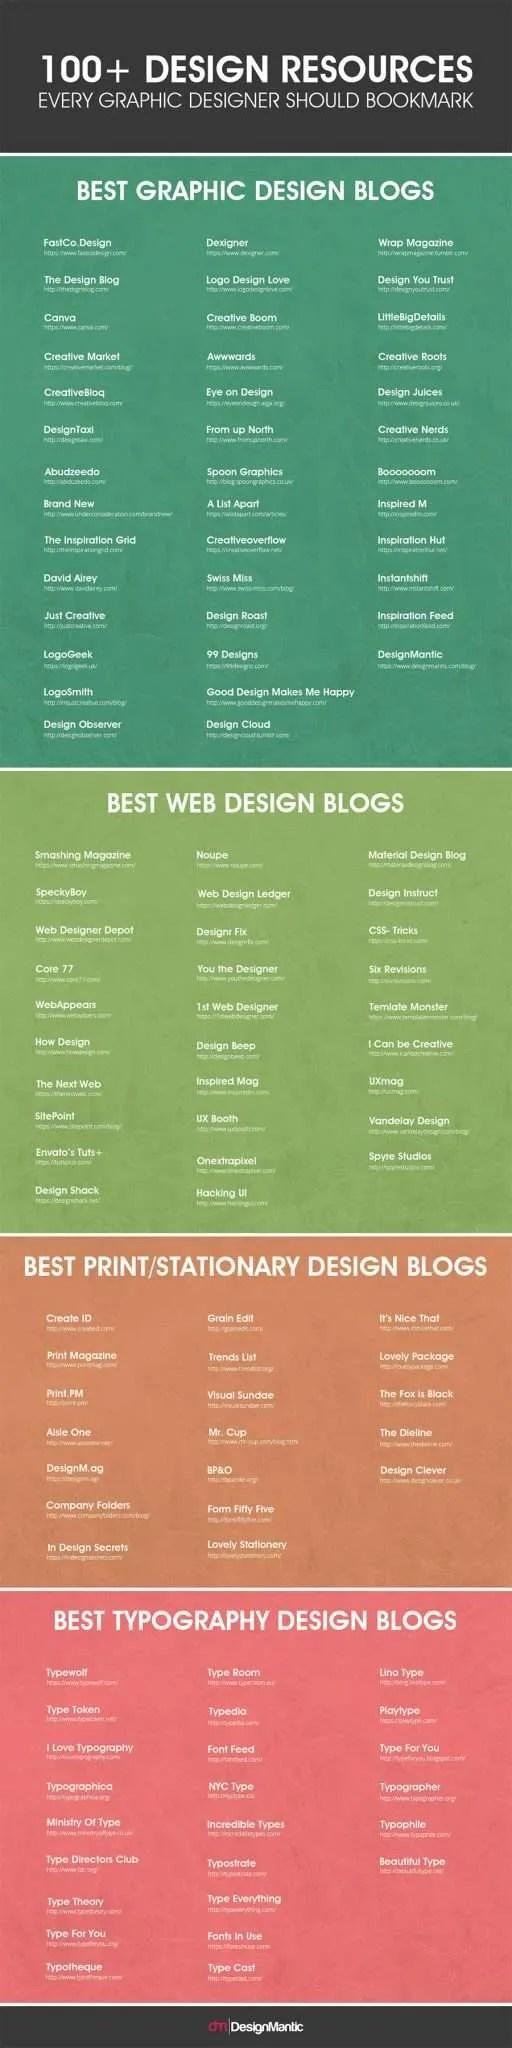 Top 100 Web design Infographic